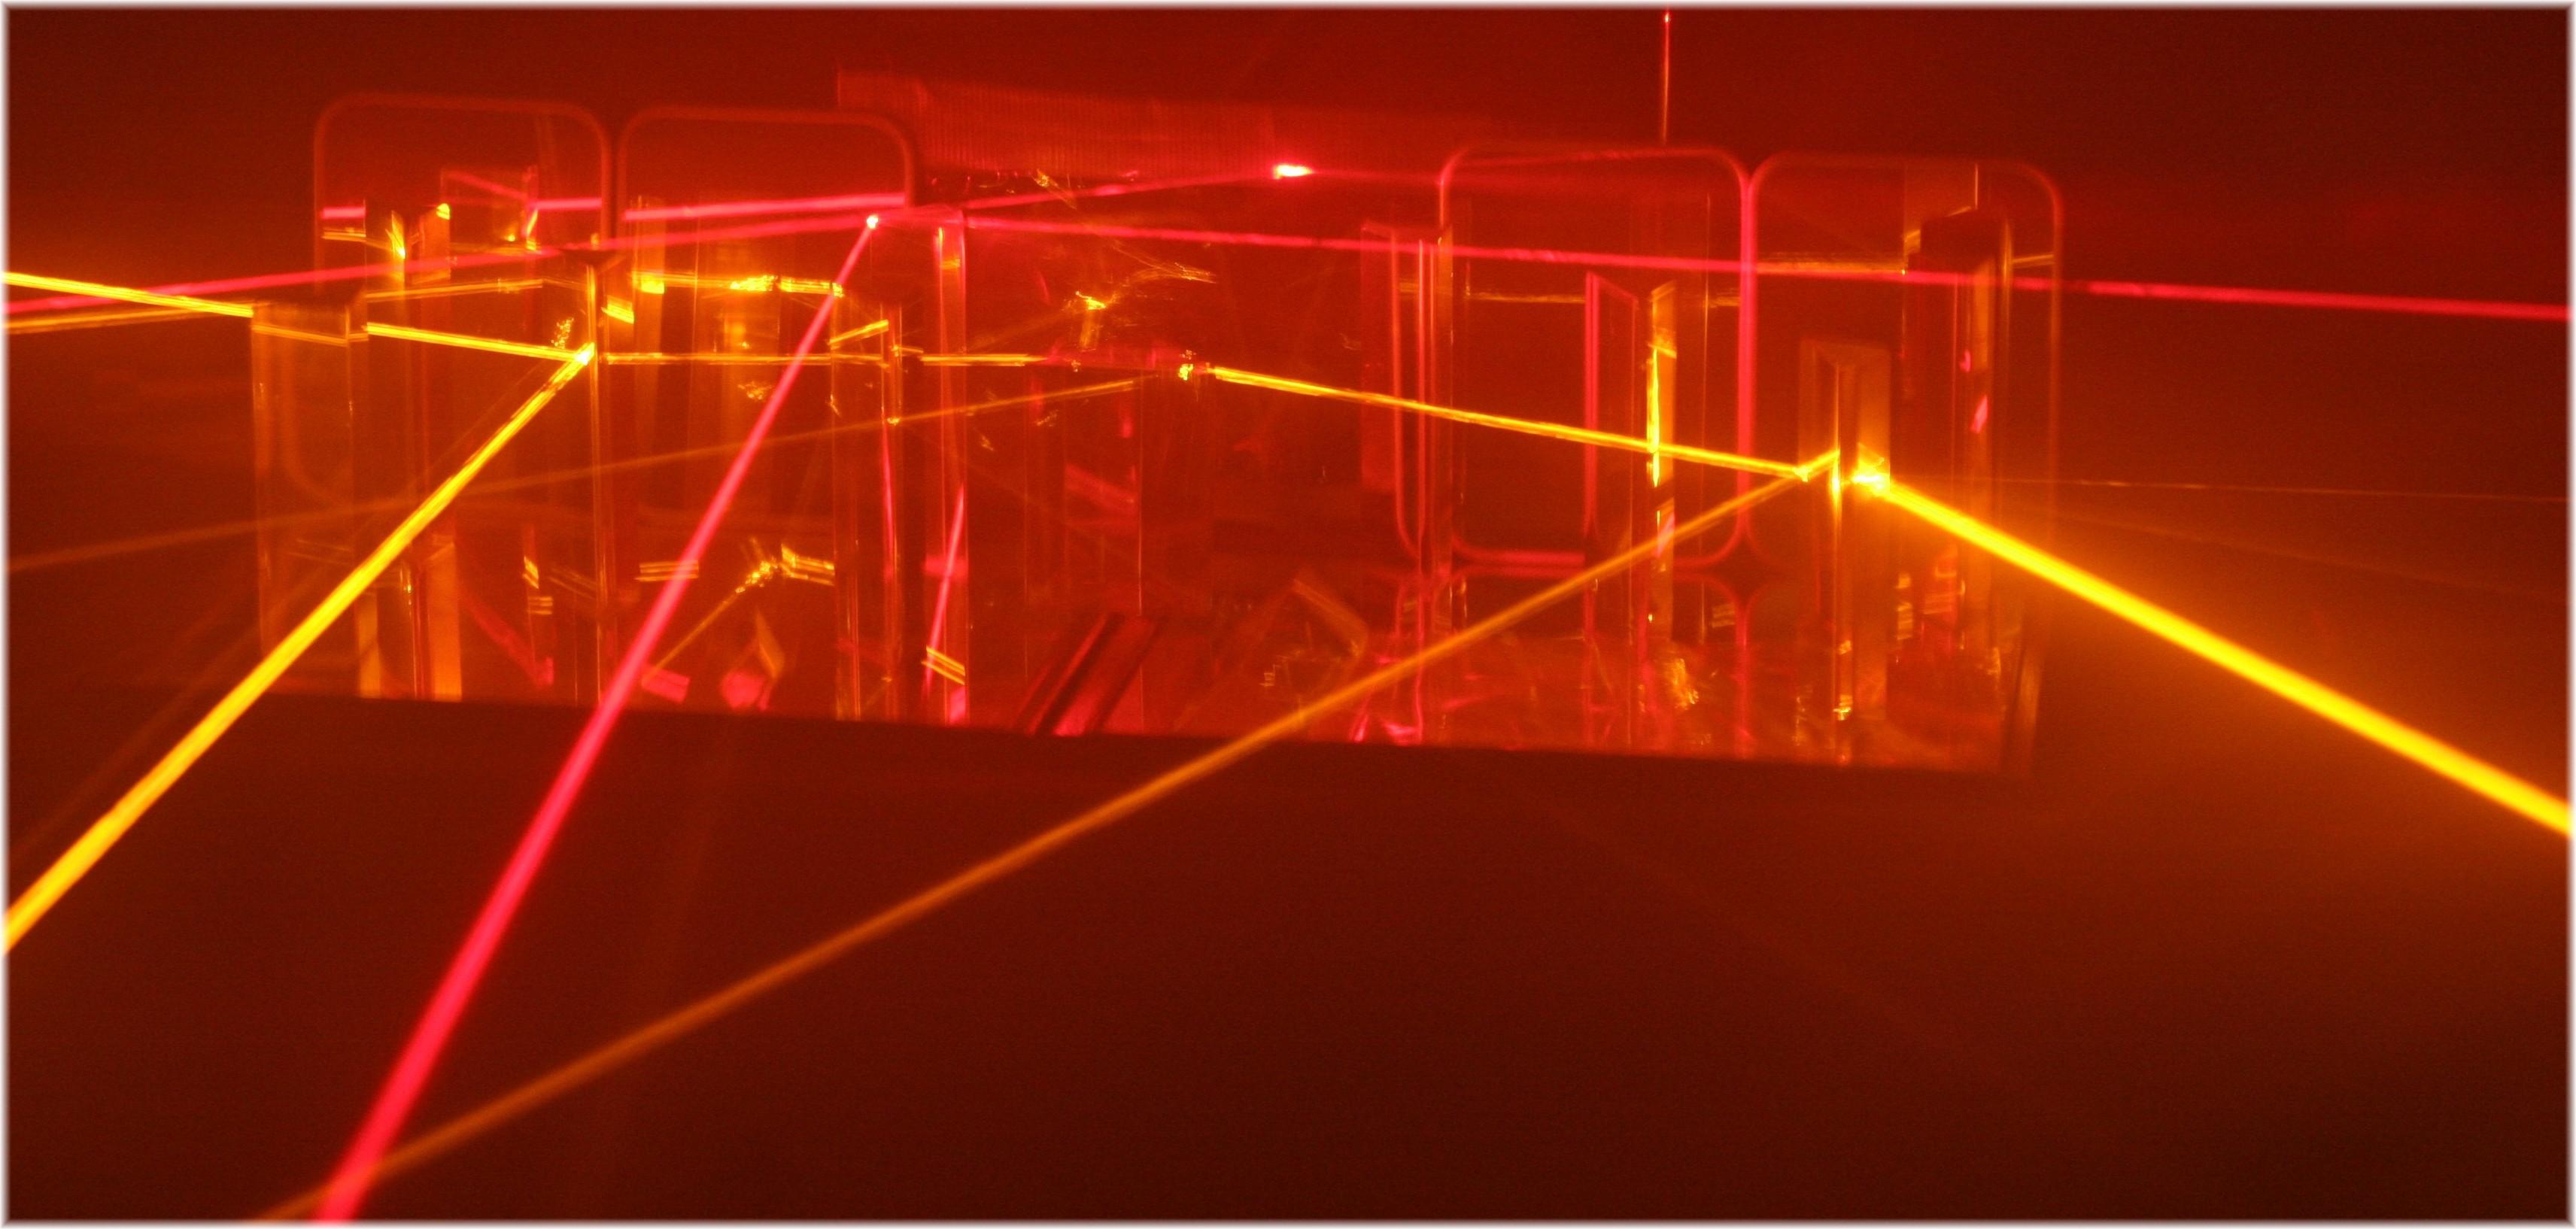 Laser Light Show